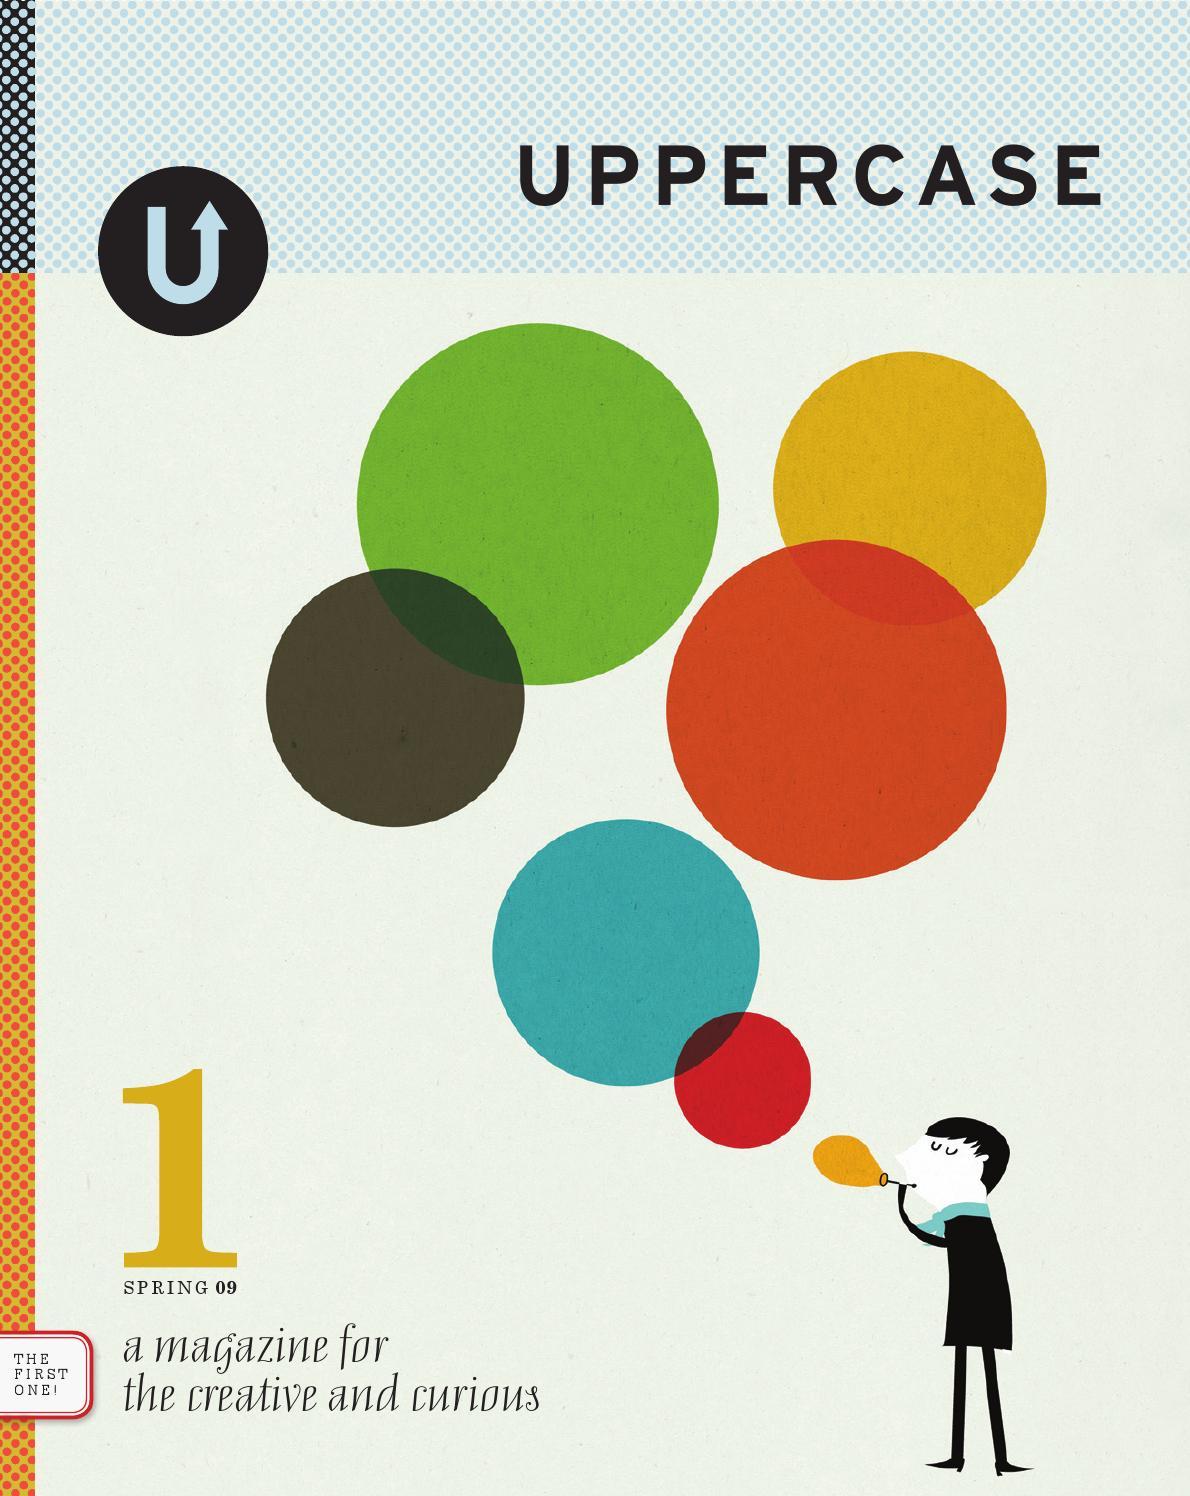 UPPERCASE magazine: issue 1 by Janine Vangool - issuu  UPPERCASE magaz...